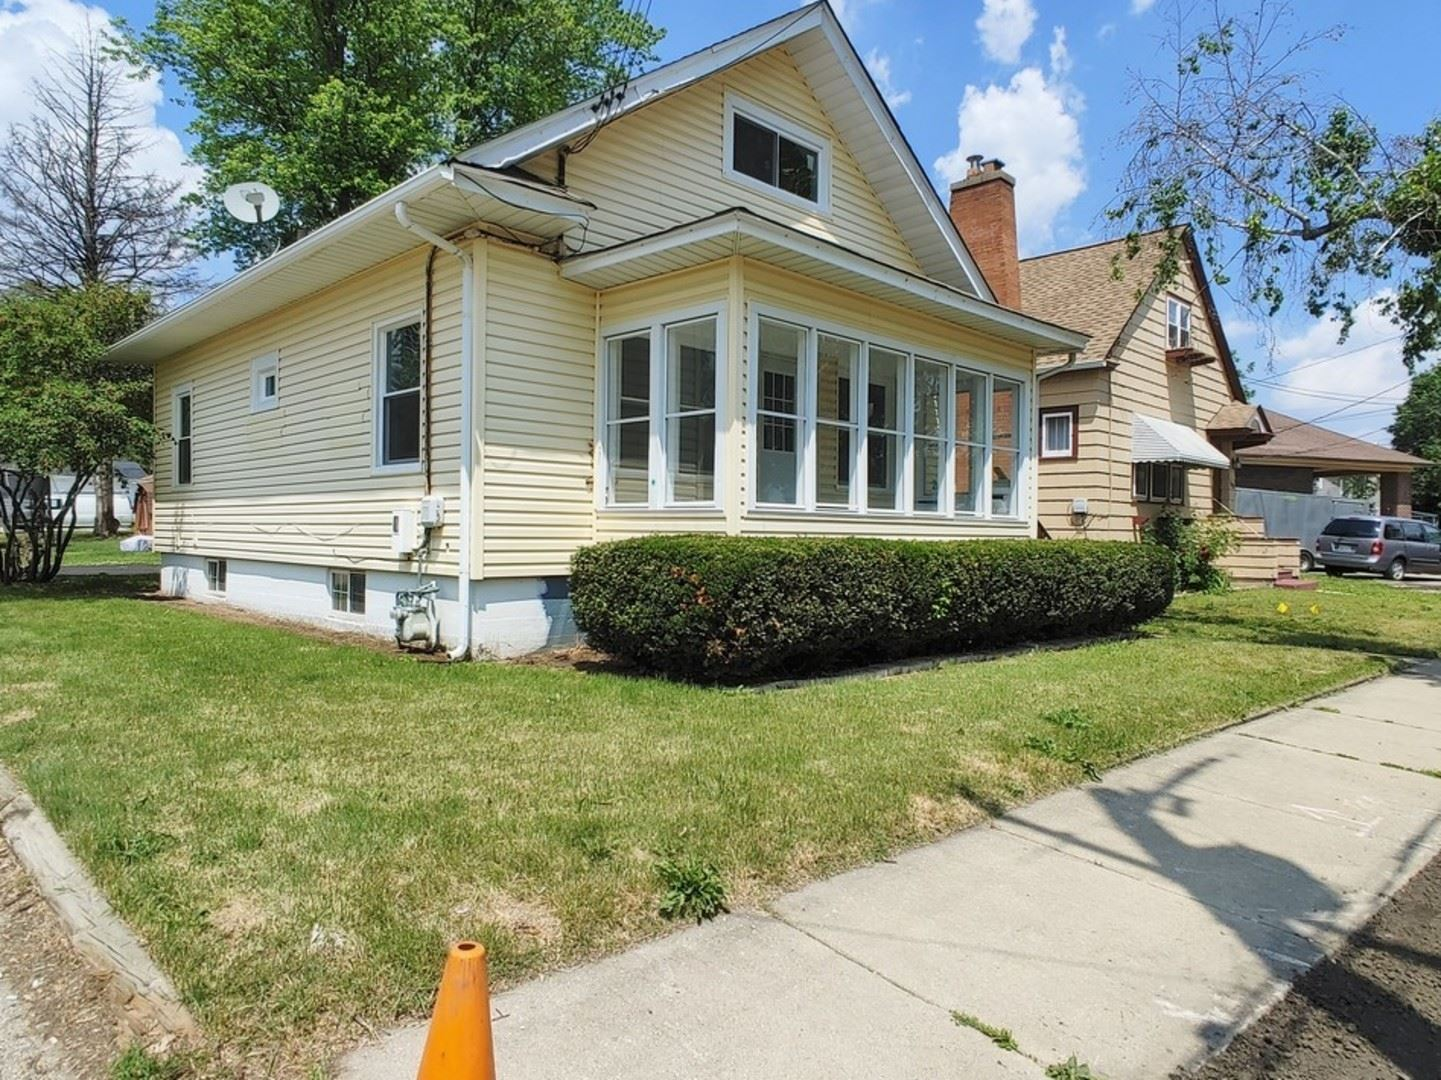 212 ORANGE Street, Elgin, IL 60123 - #: 11123134